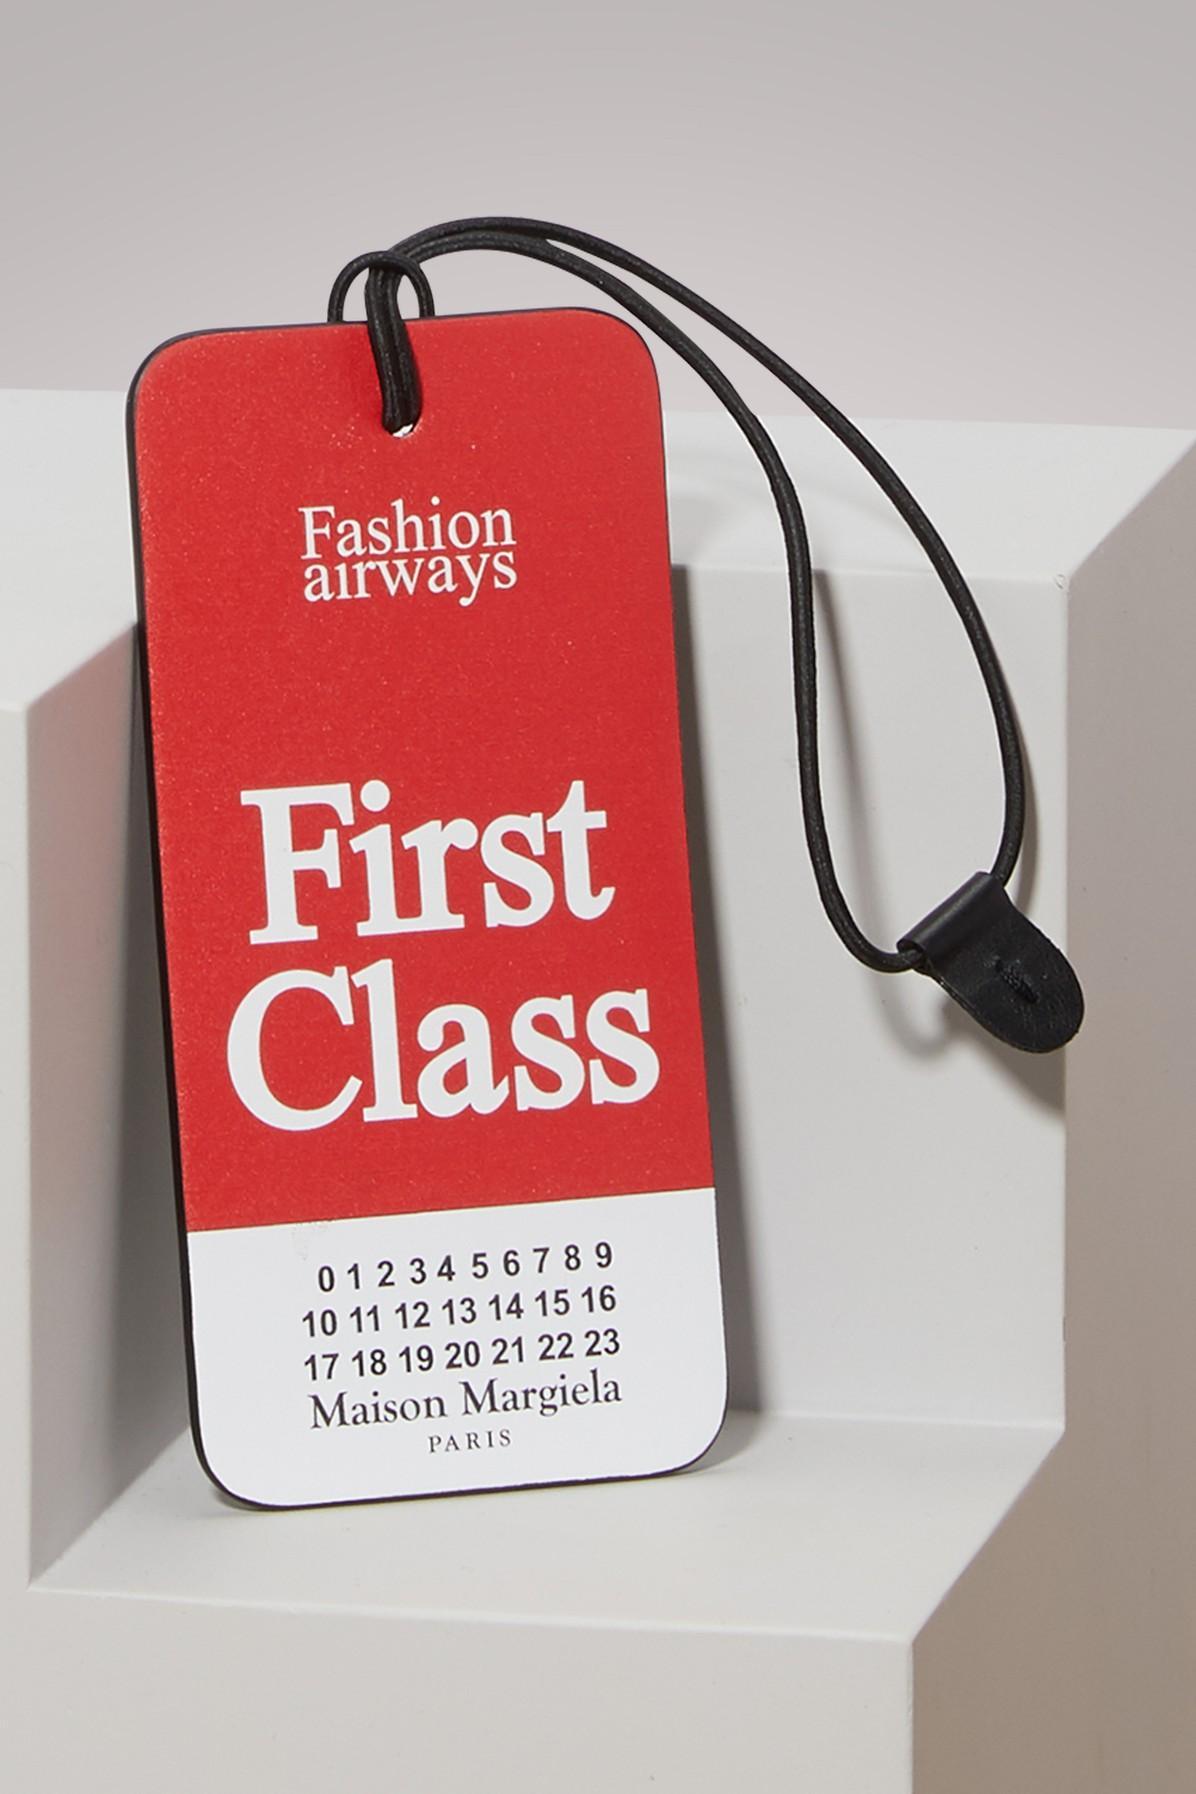 Maison Margiela First Class Tag